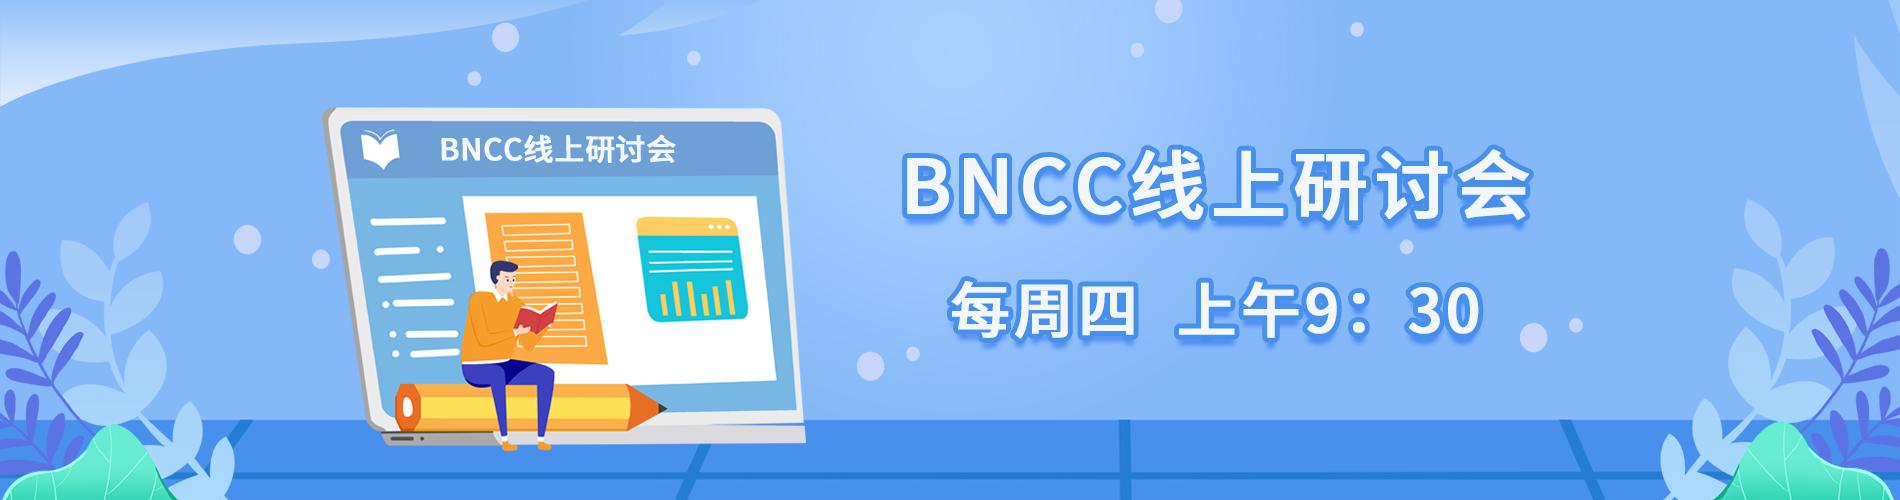 BNCC线上研讨会-北纳生物